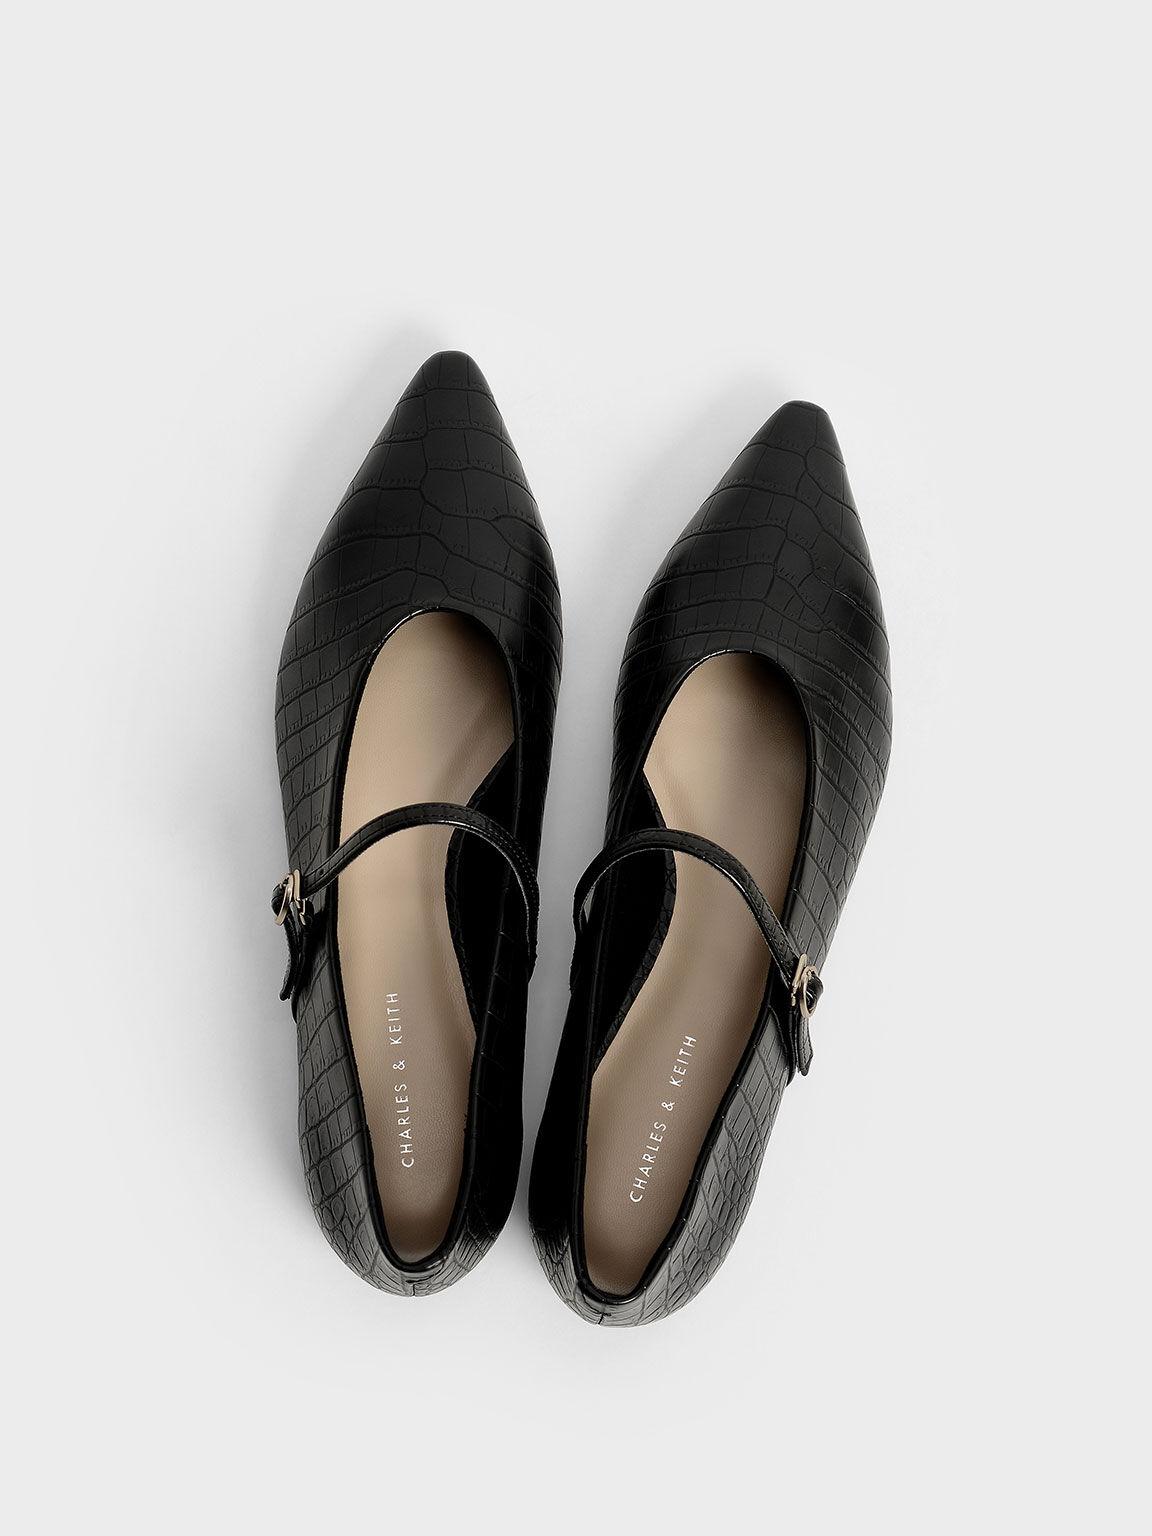 Croc-Effect Mary Jane Flats, Animal Print Black, hi-res